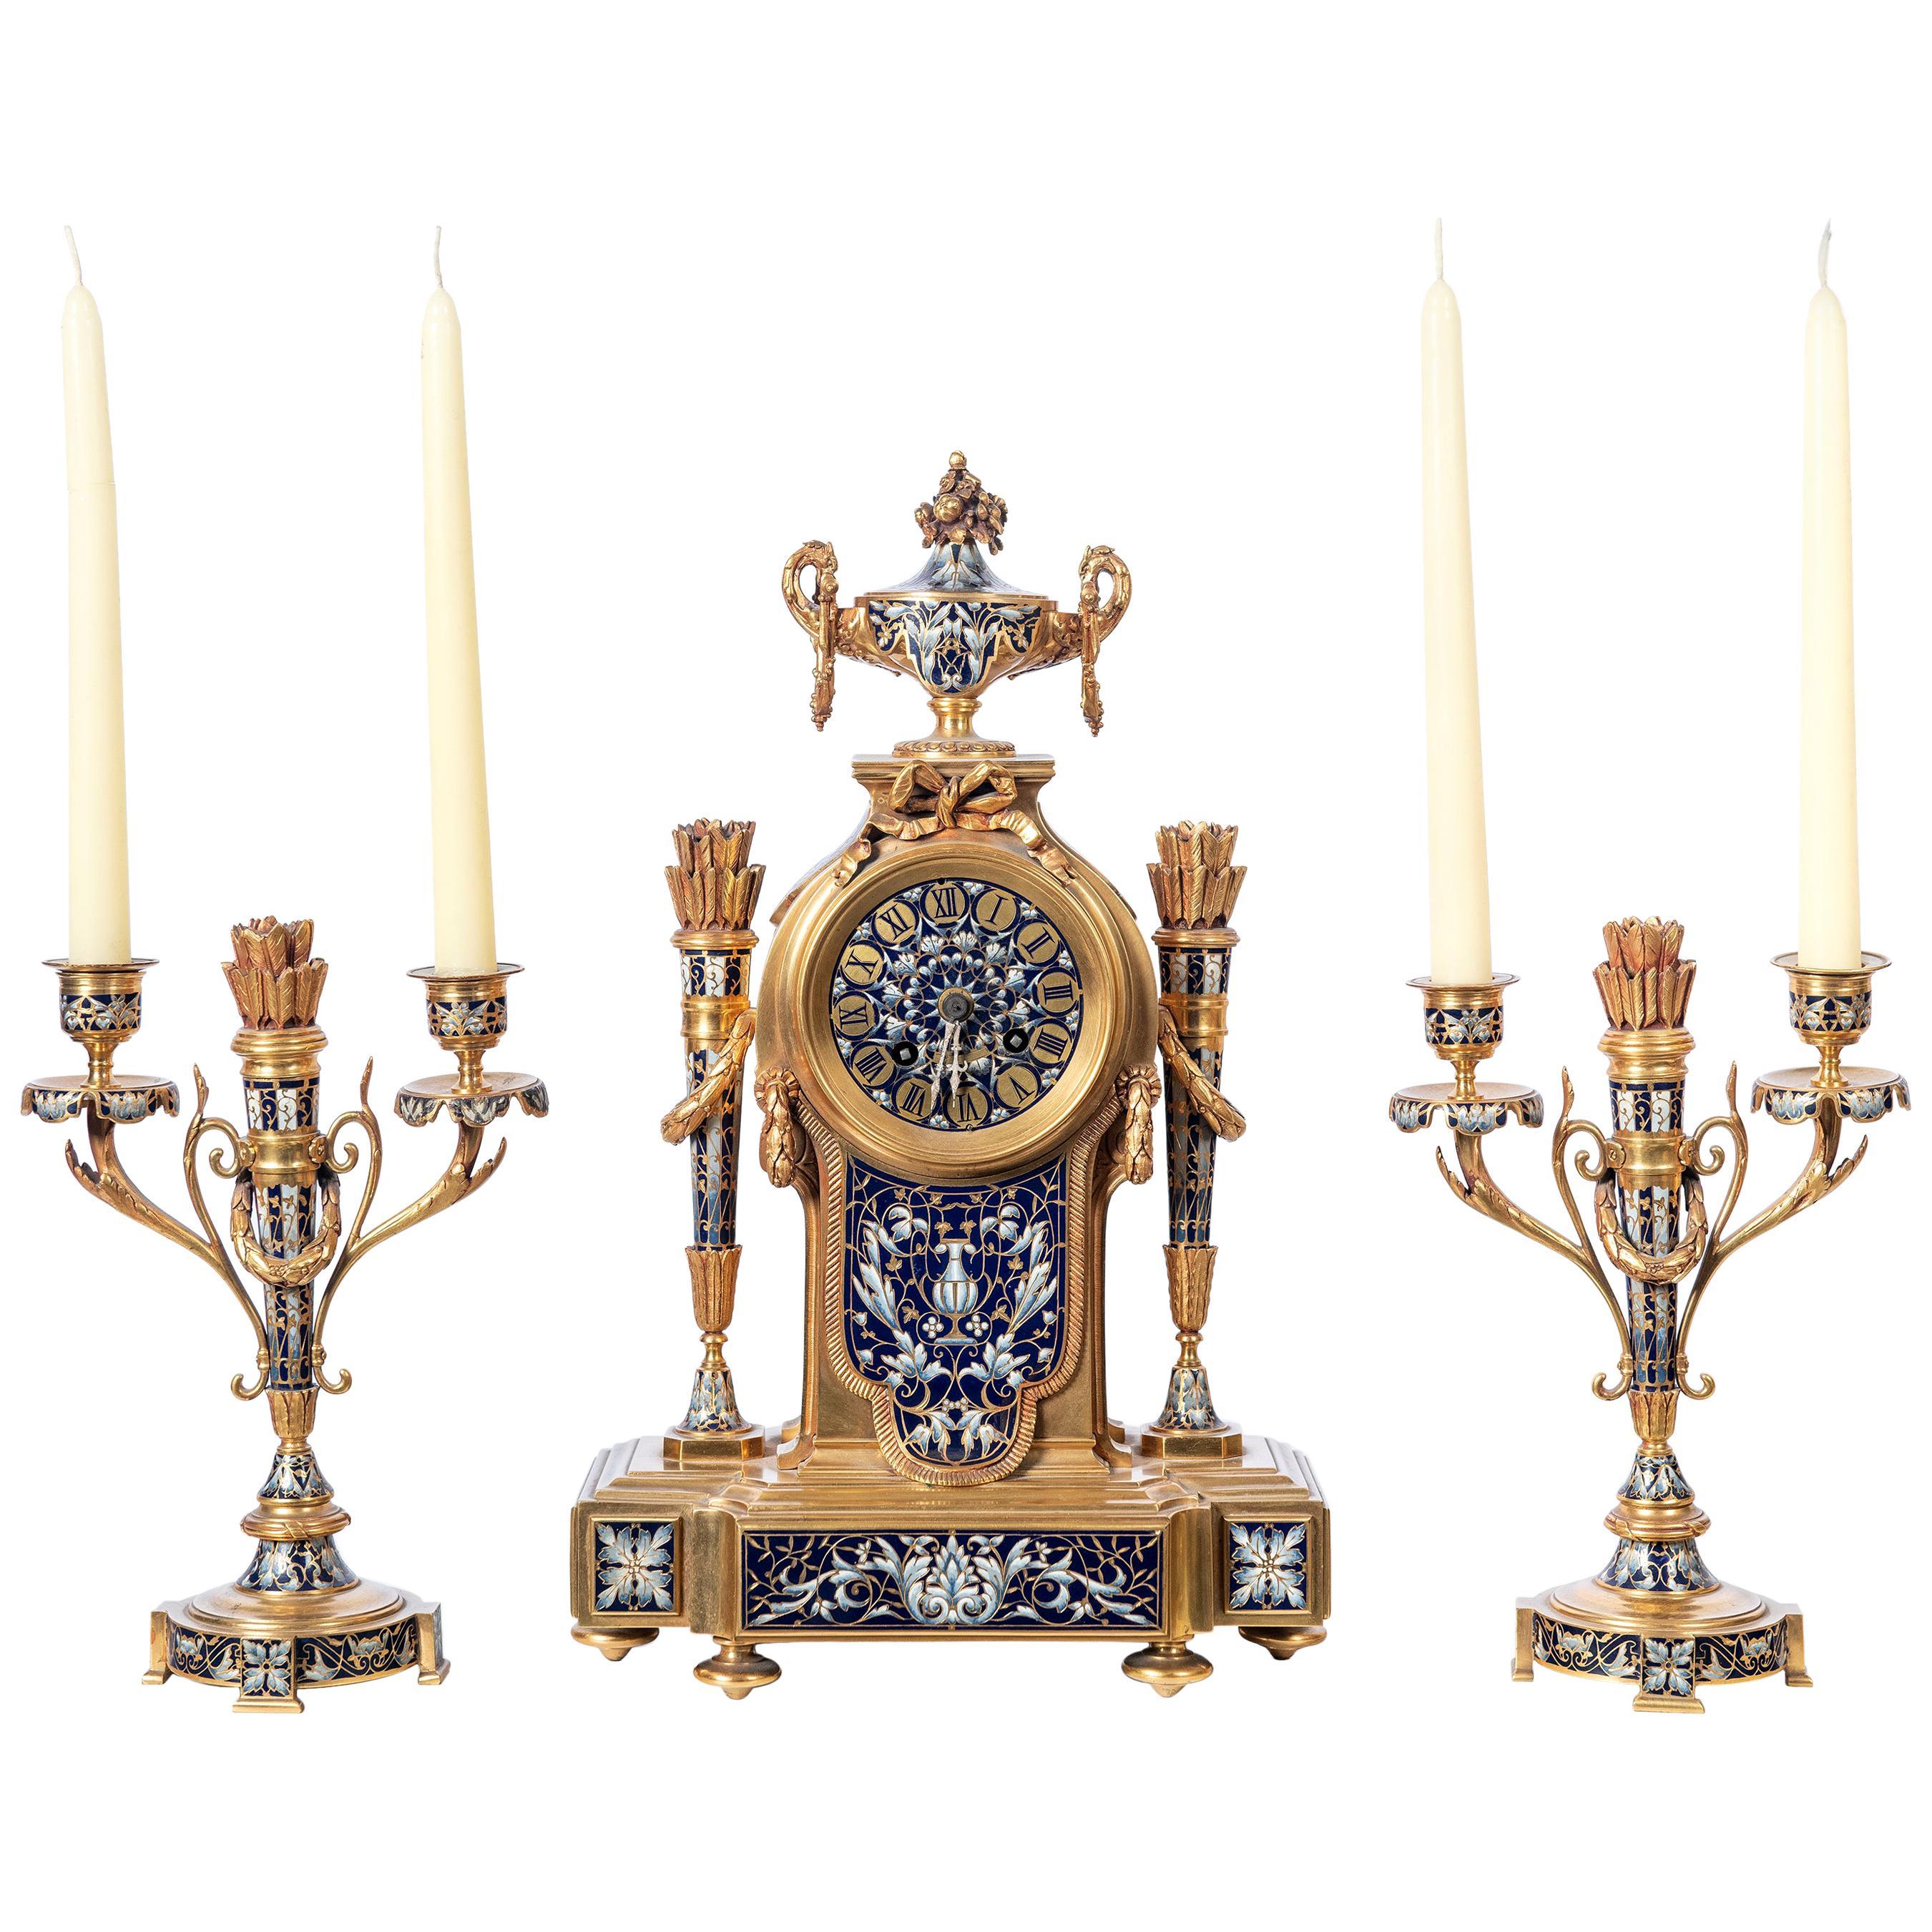 Gilt-Bronze and Cloisonné Garniture. France, 19th Century